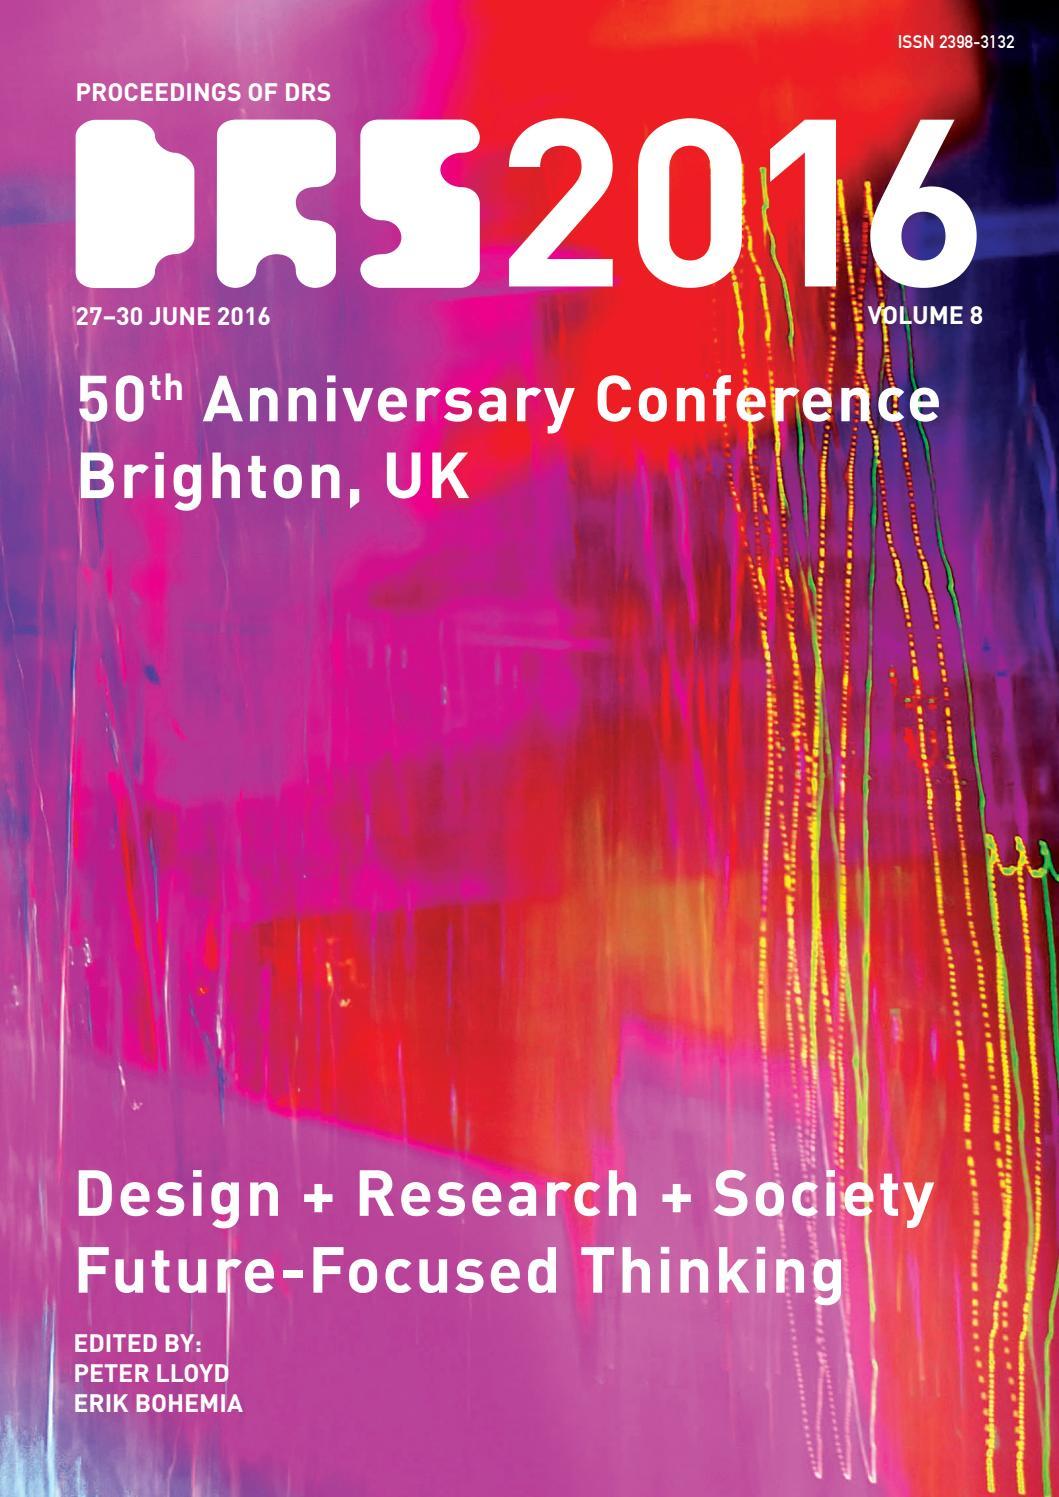 Proceedings of DRS 2016 volume 08 by Erik Bohemia - issuu